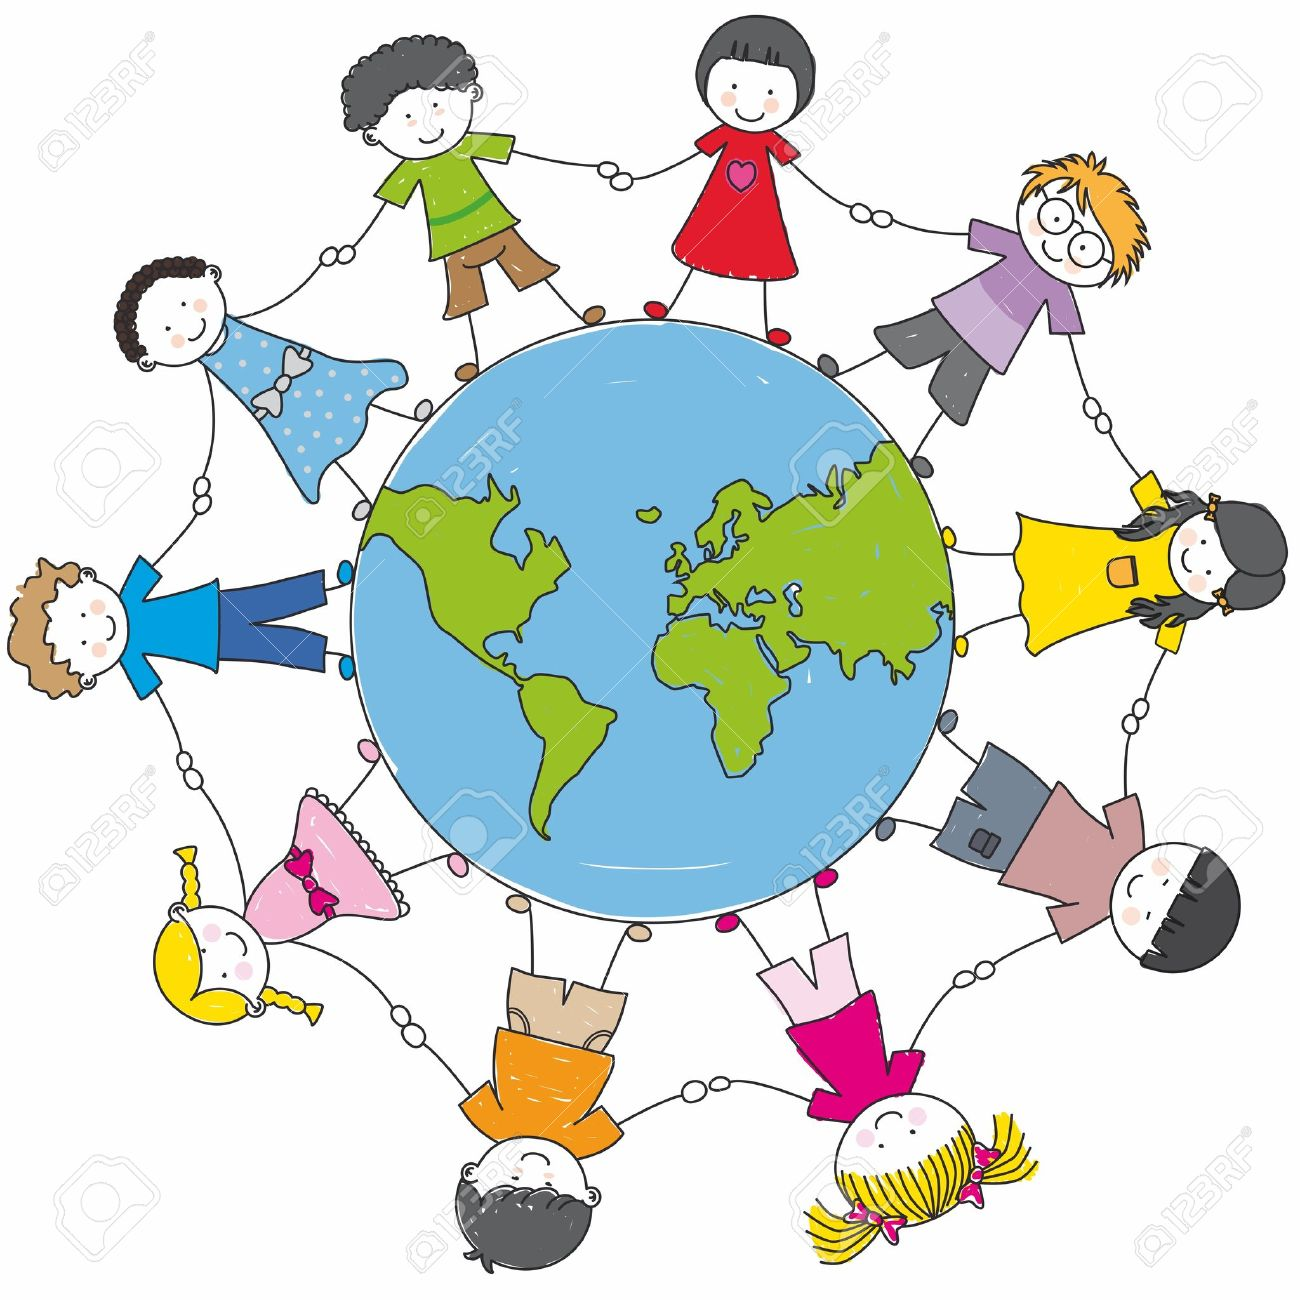 Kinderkreis clipart  Kinder Kreis Lizenzfreie Vektorgrafiken Kaufen: 123RF